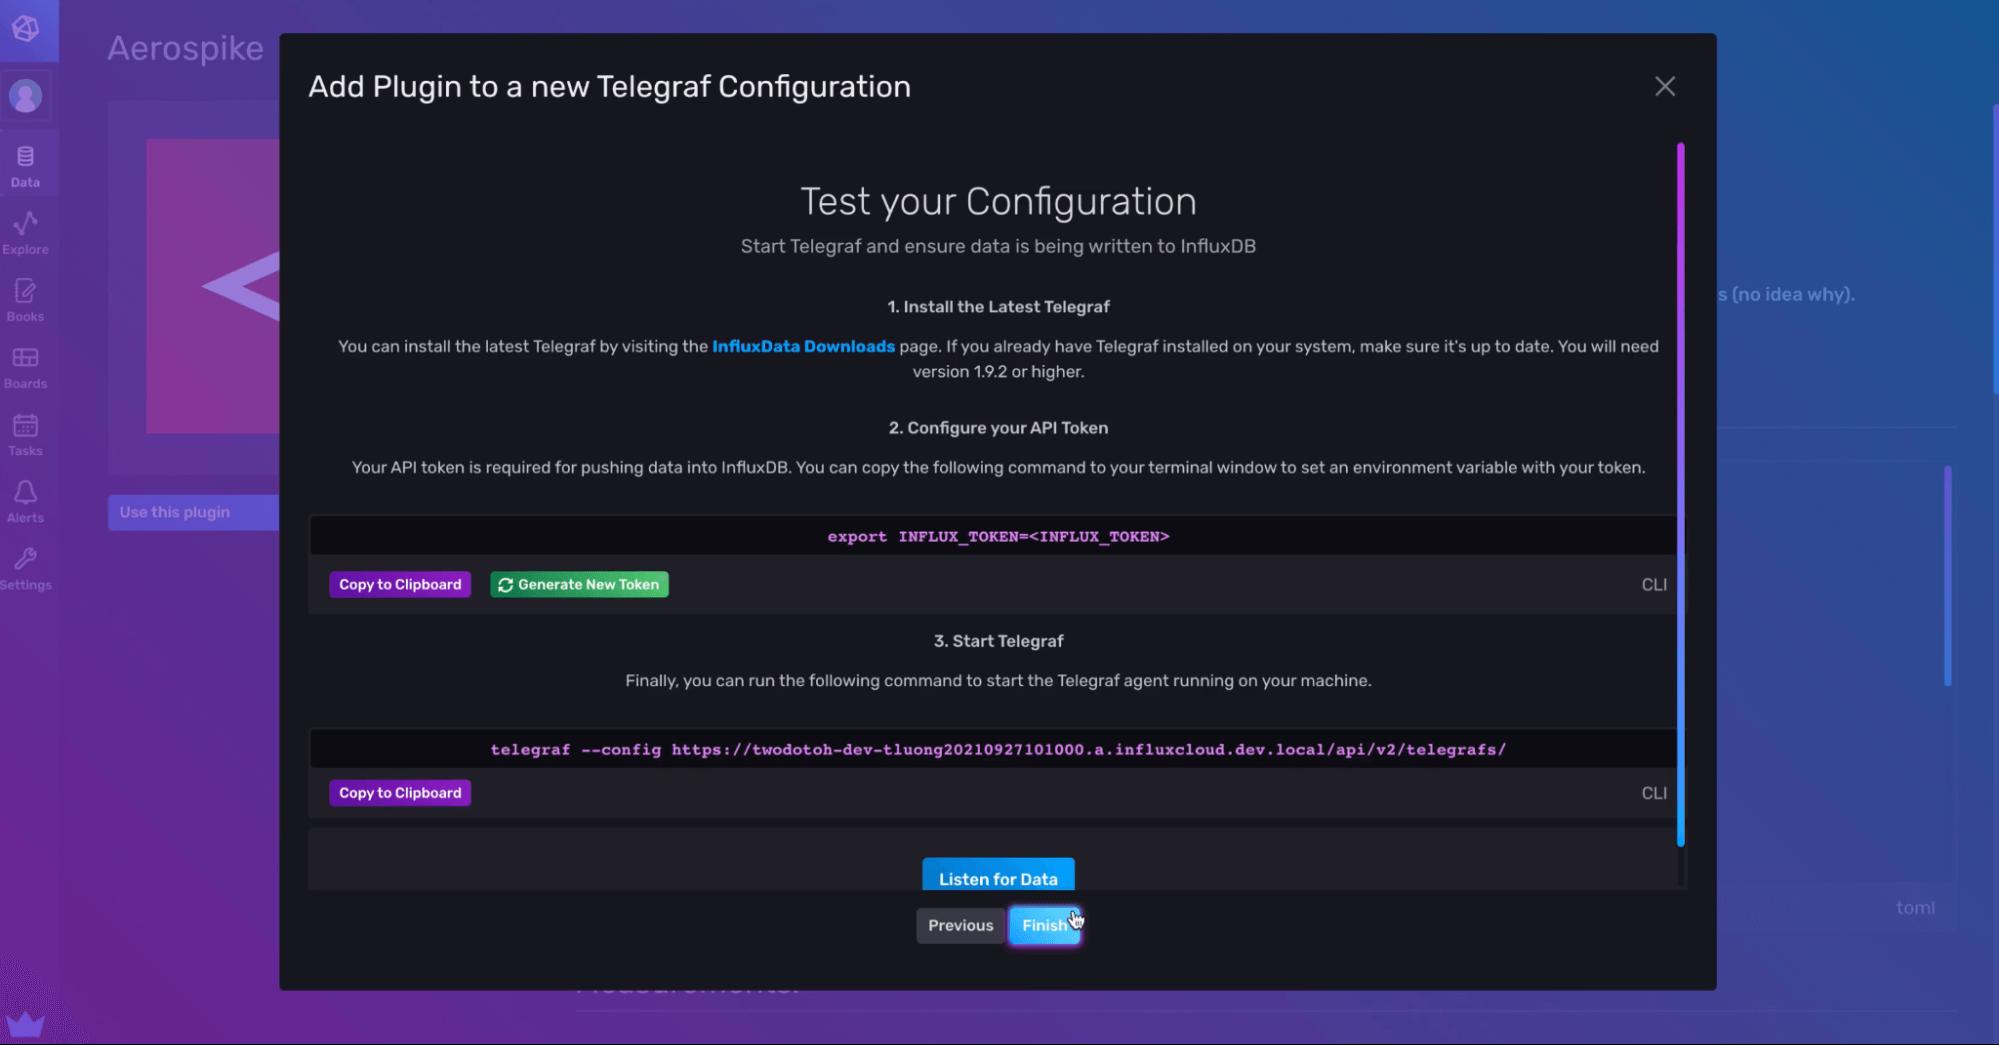 Test your Configuration